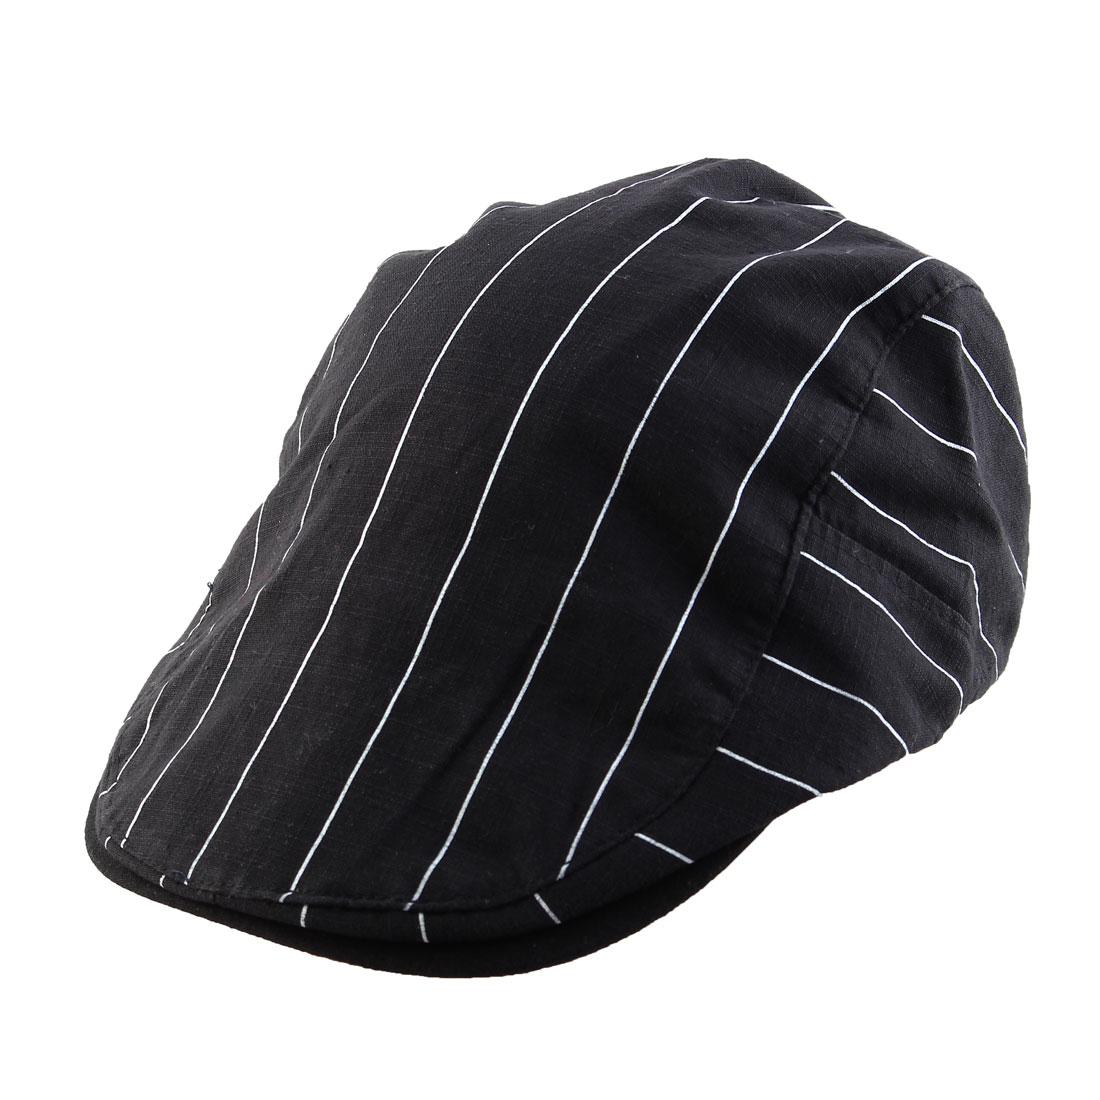 Stripe Pattern Newsboy Duckbill Ivy Cap Traveling Driving Flat Beret Hat Black